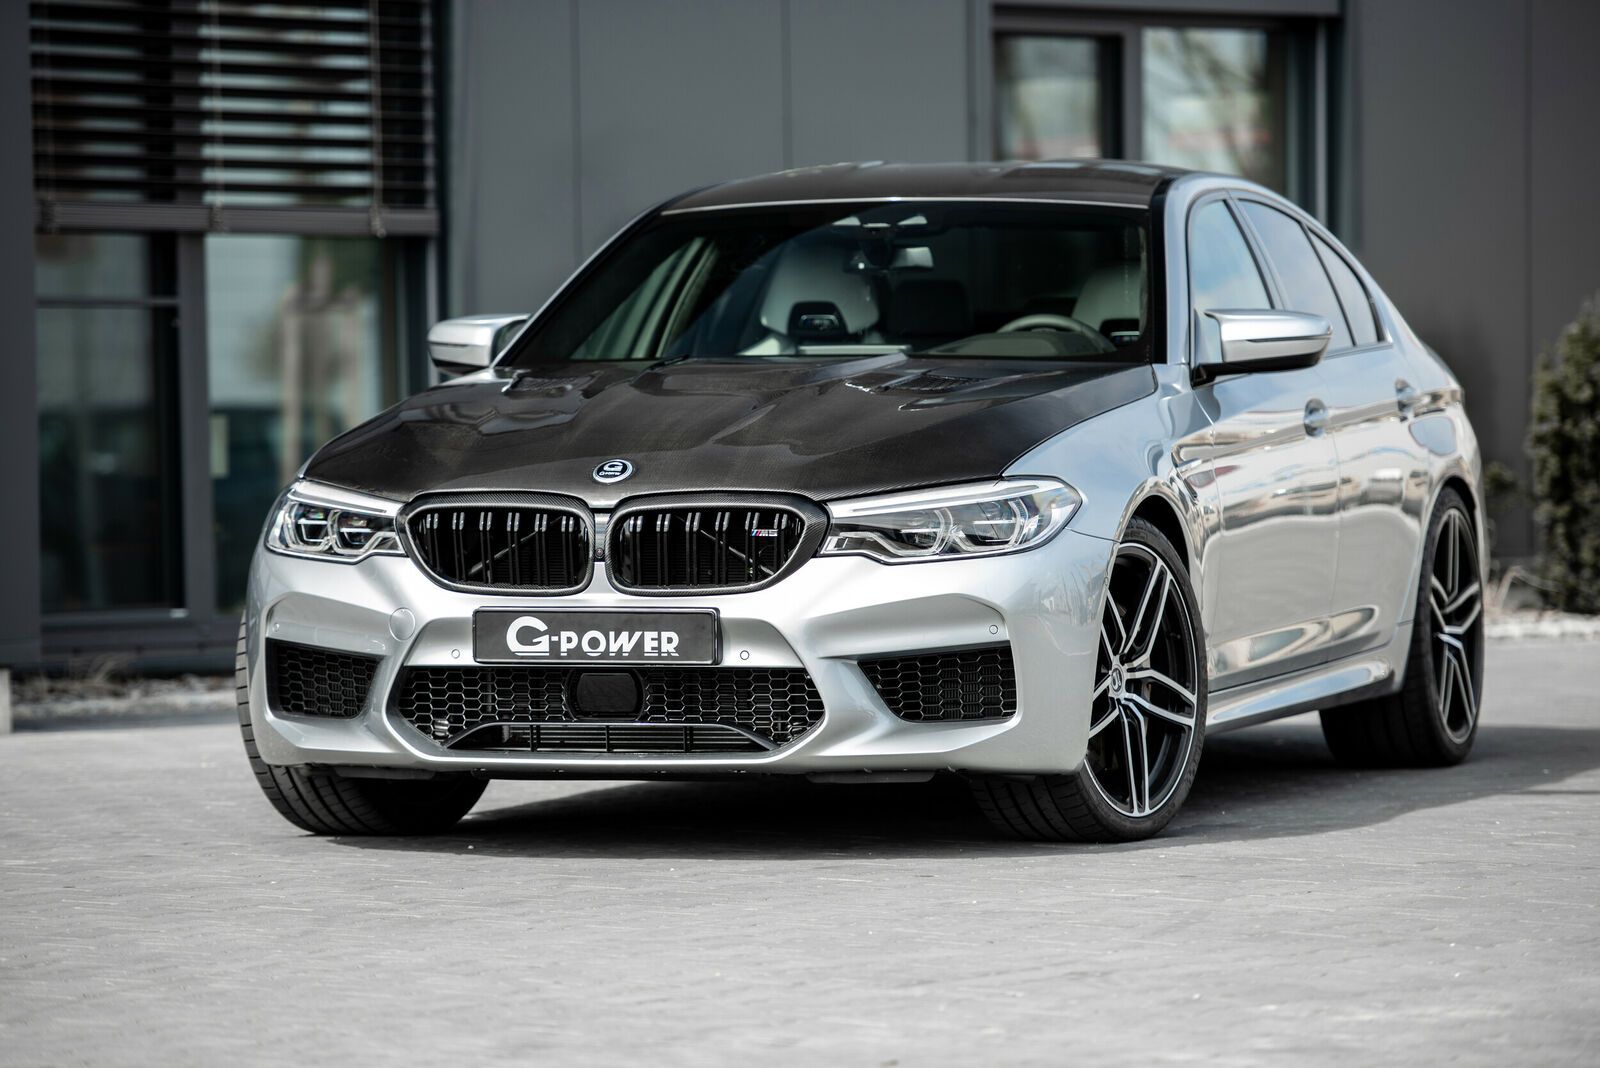 BMW_M5_G-Power_carbon_0000